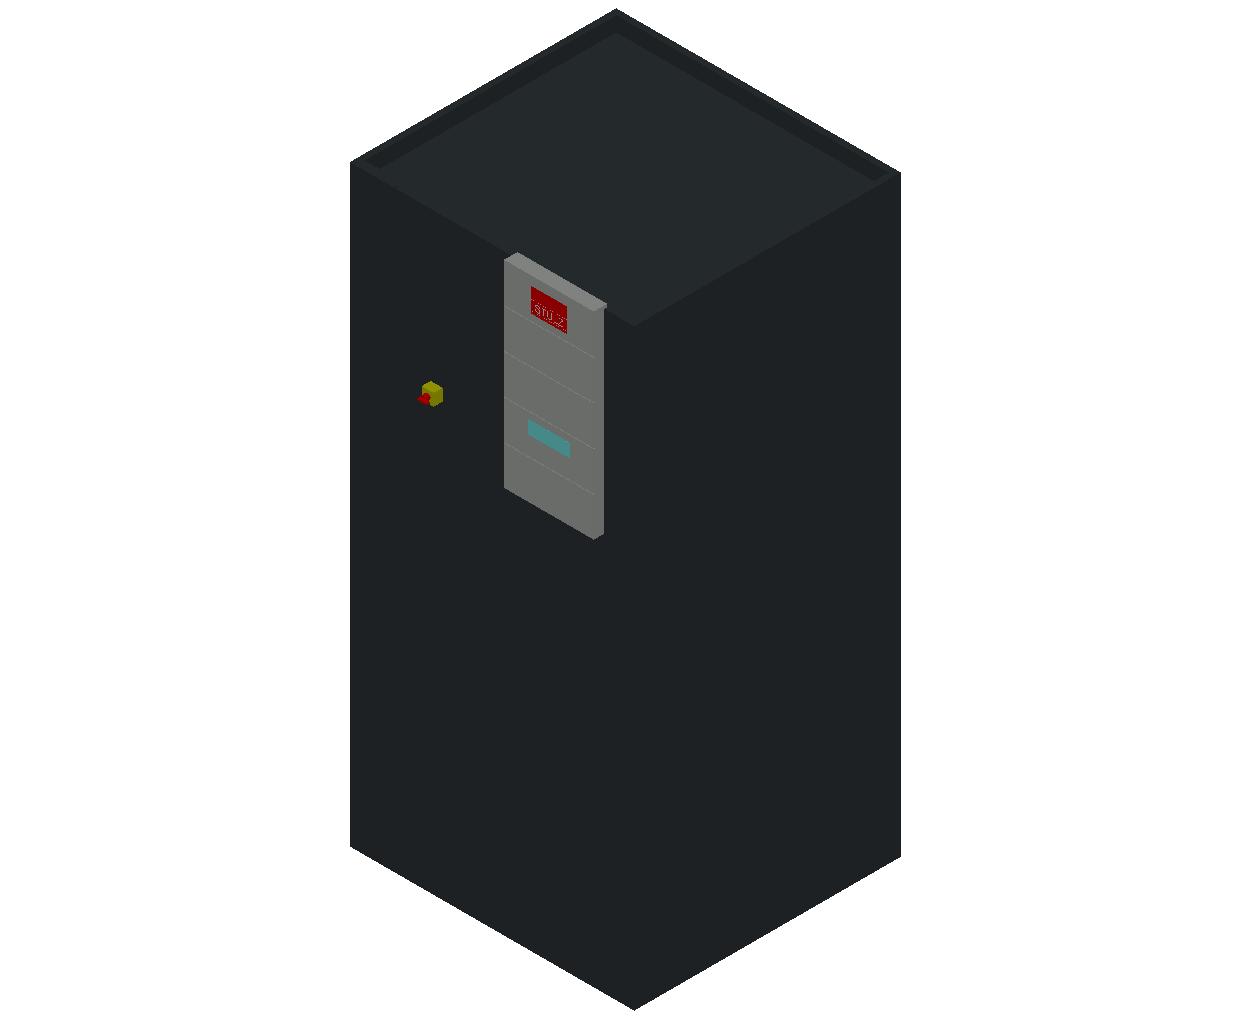 HC_Air Conditioner_Indoor Unit_MEPcontent_STULZ_CyberAir 3PRO_ASD-ALD_Single Circuit GE_ALD_231_GE_INT-EN.dwg